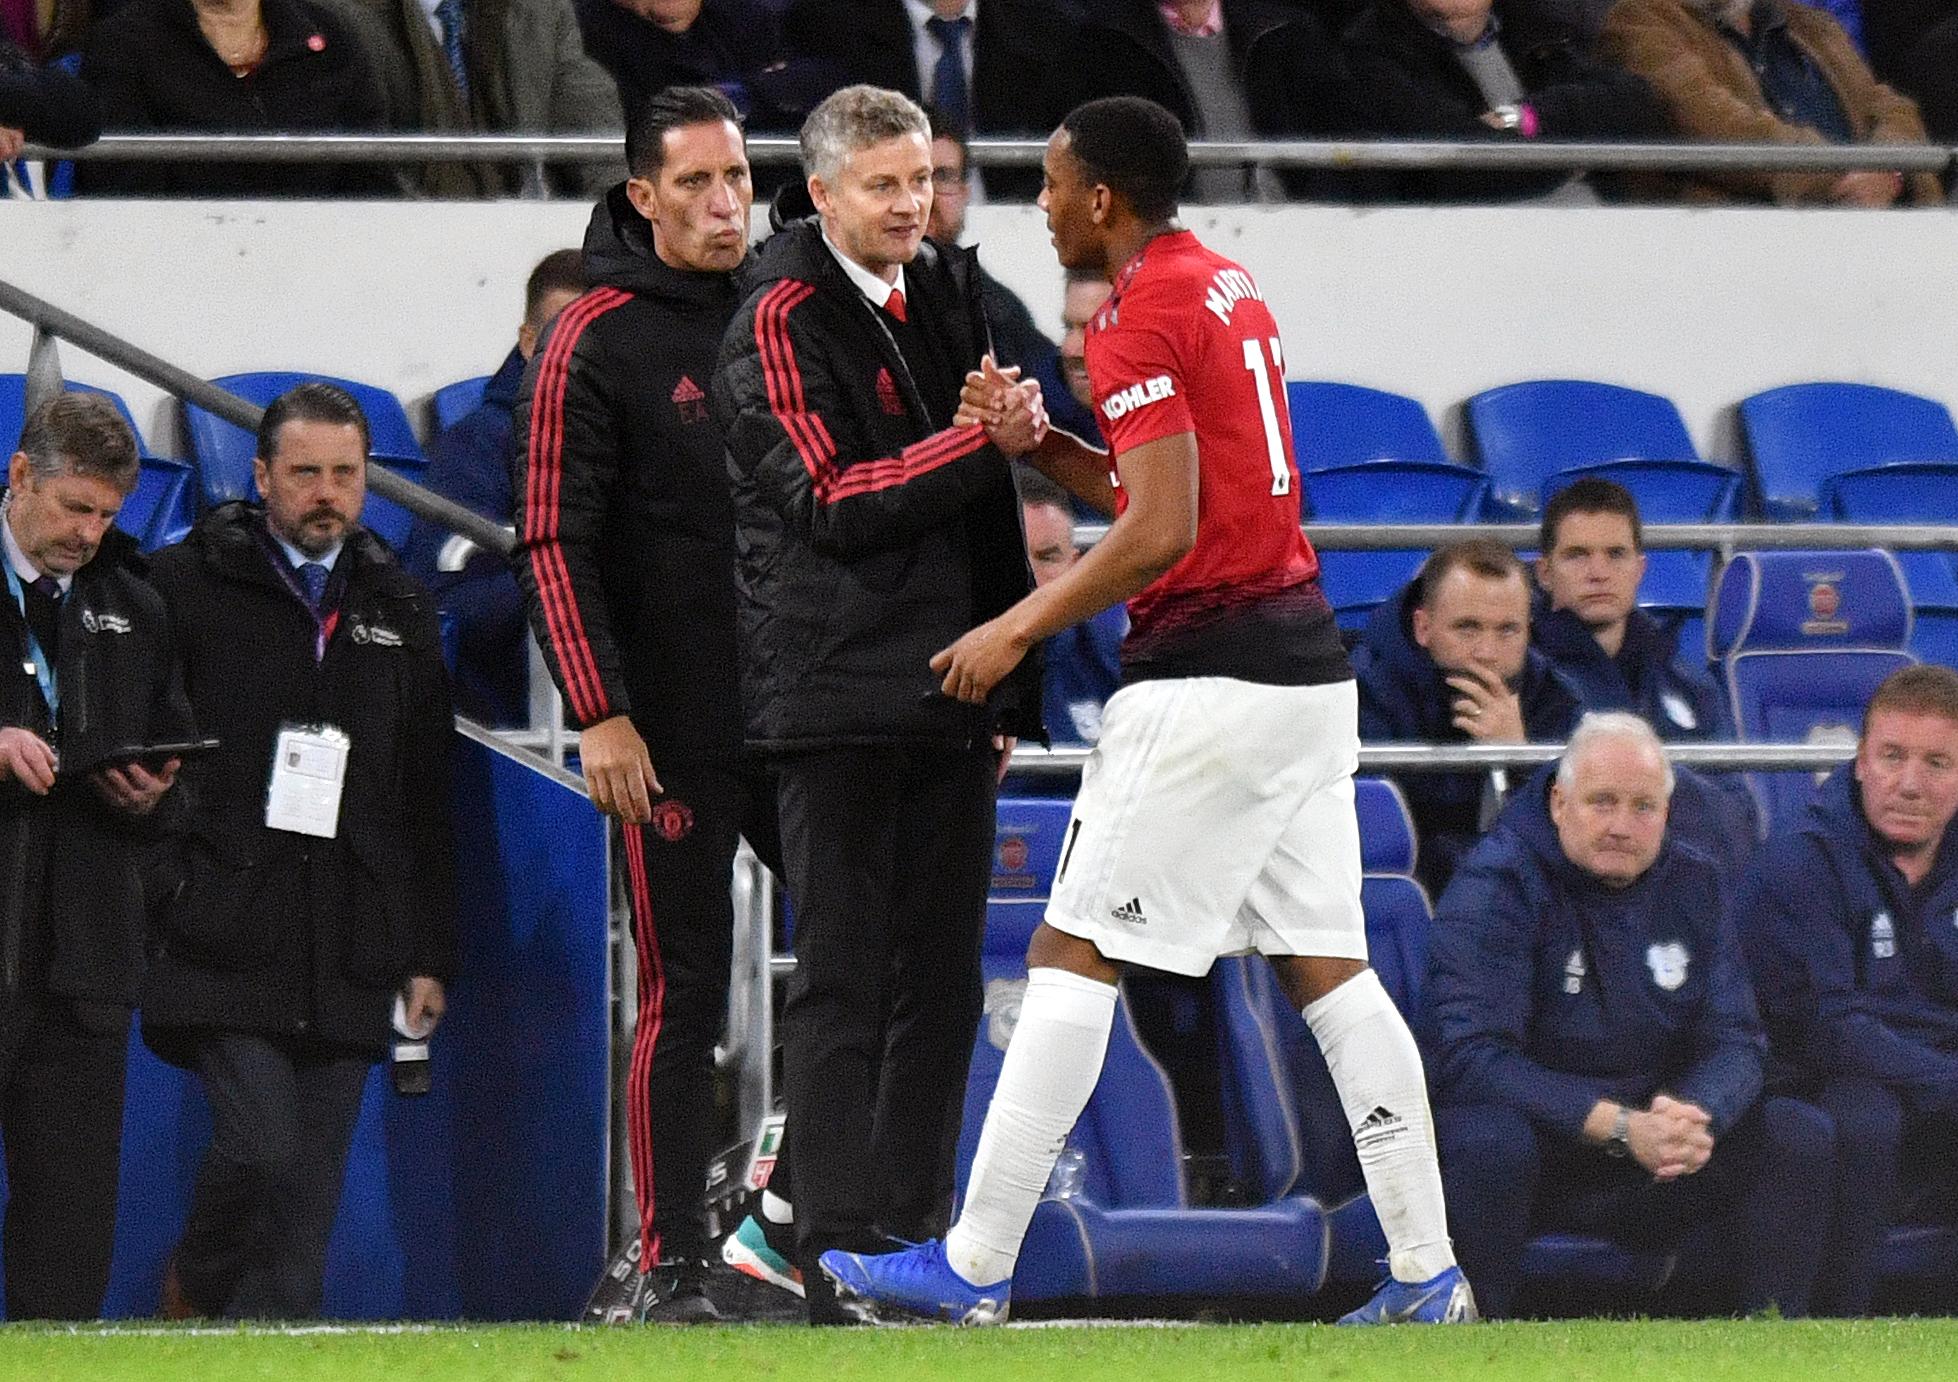 Man Utd's team news for last away game of season at Huddersfield